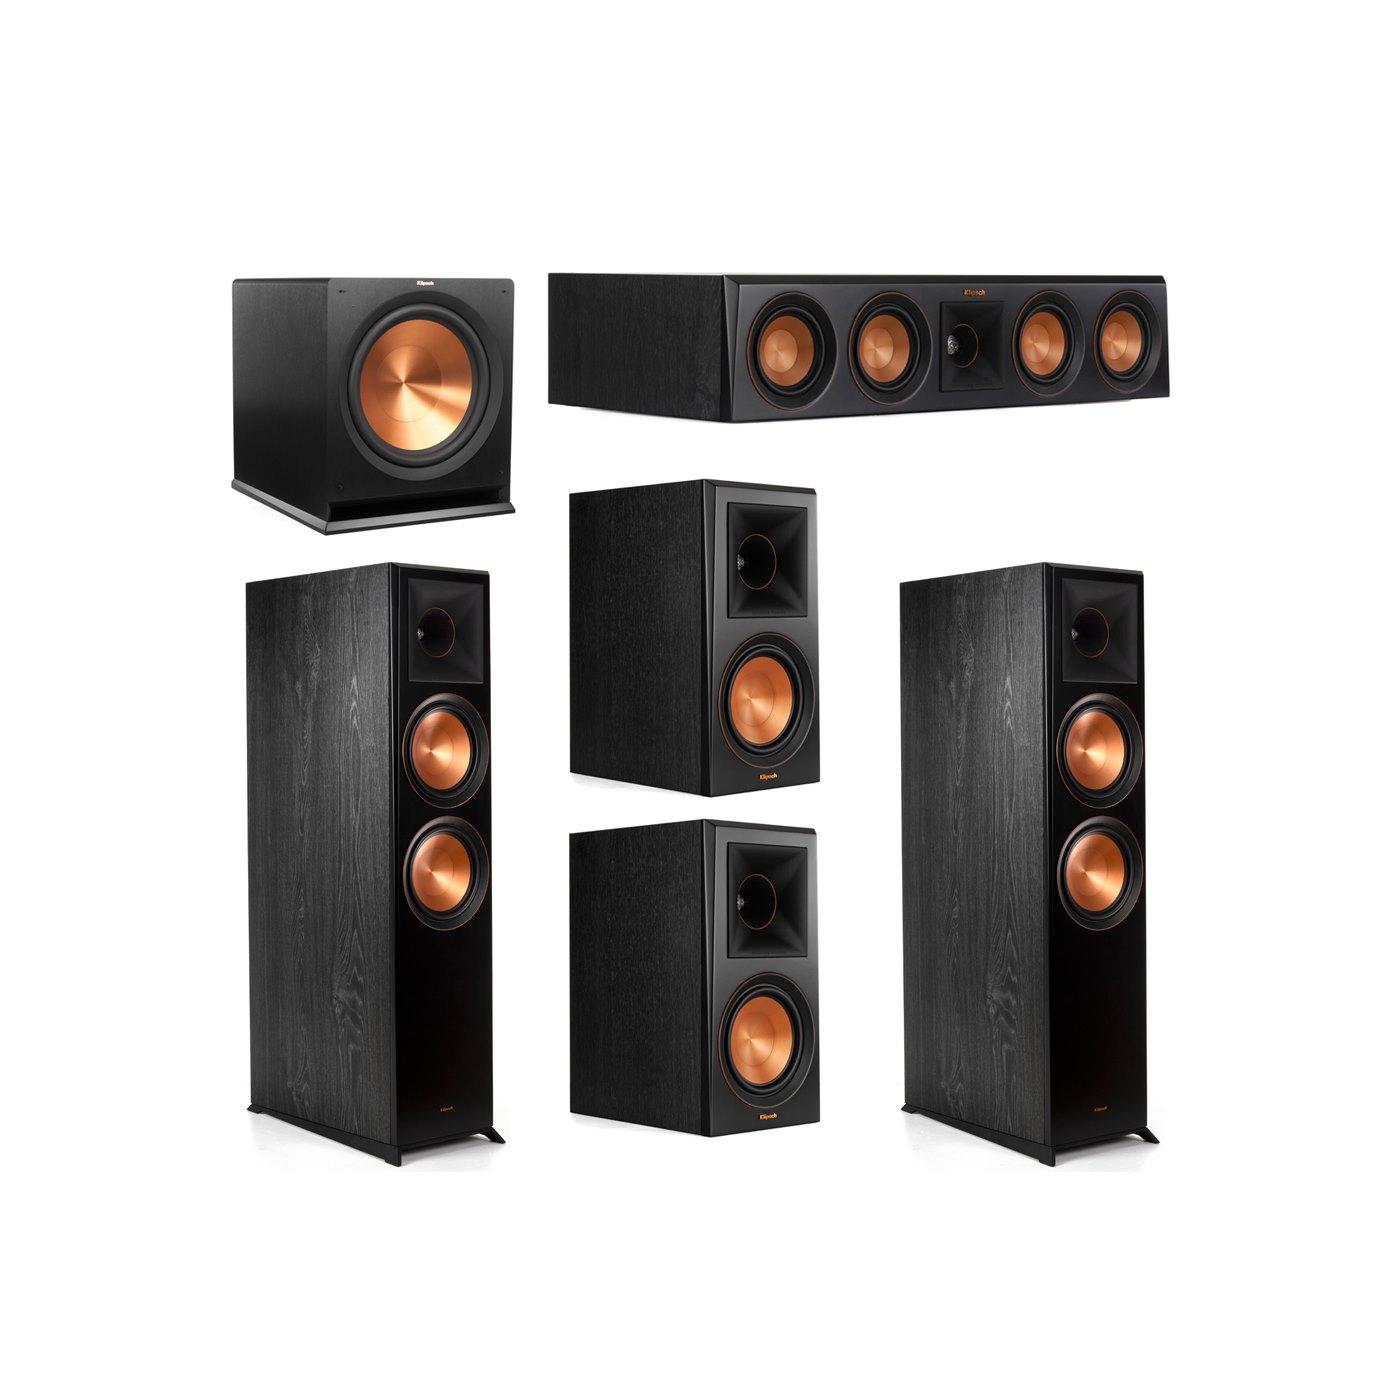 Klipsch 5.1 System with 2 RP-8000F Floorstanding Speakers, 1 Klipsch RP-404C Center Speaker, 2 Klipsch RP-600M Surround Speakers, 1 Klipsch R-115SW Subwoofer